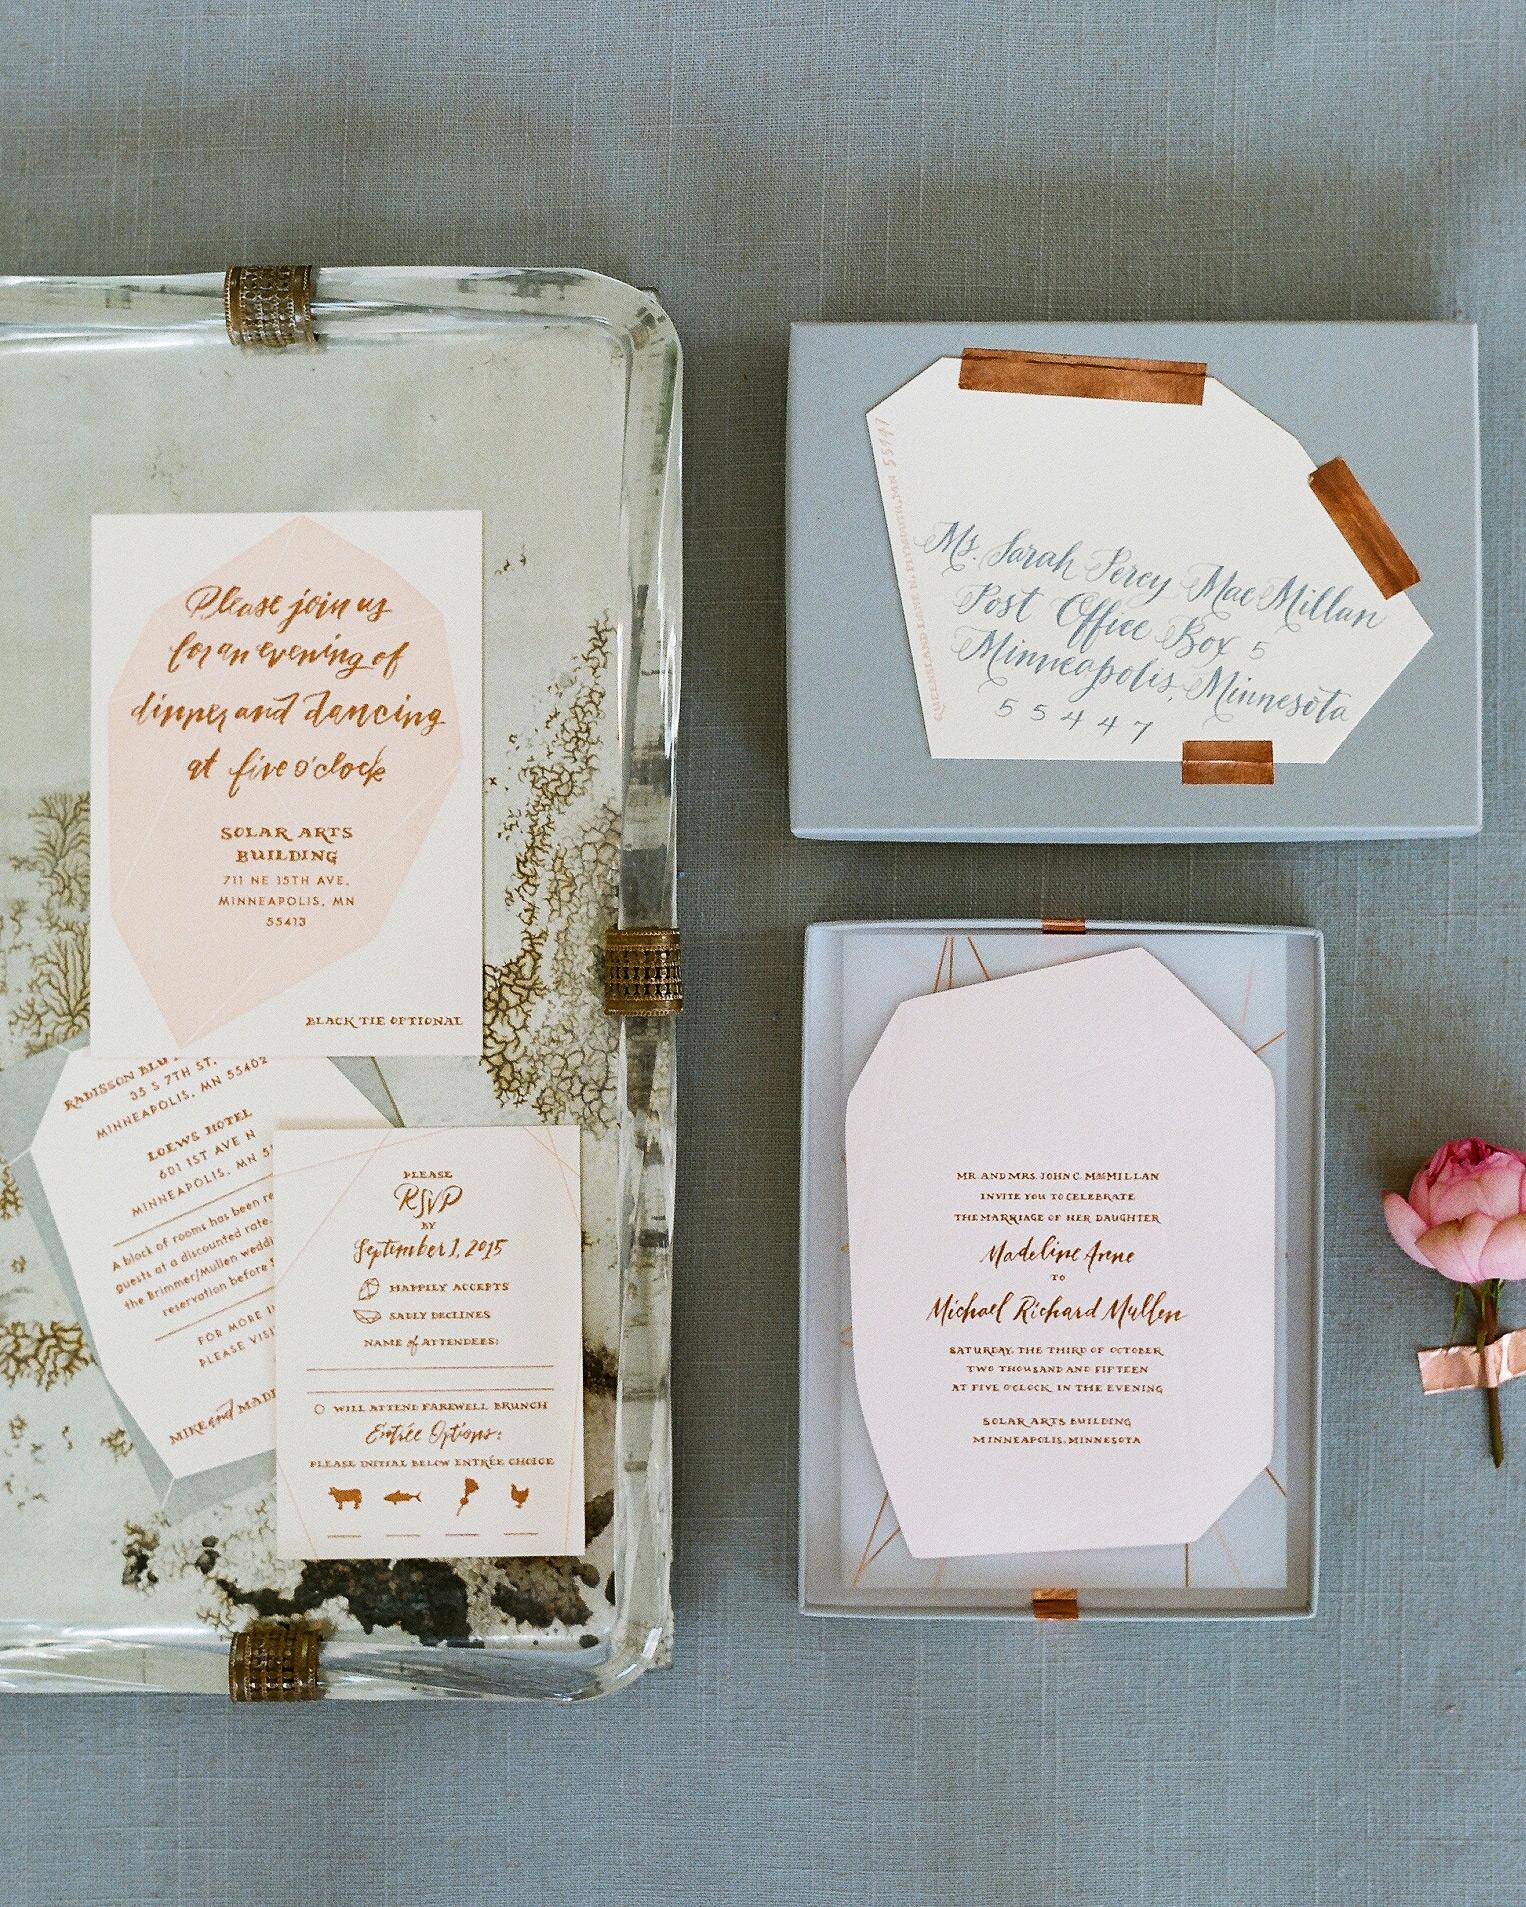 maddy-mike-wedding-invite-009.9784.15c.2015.49-6134174-0716.jpg